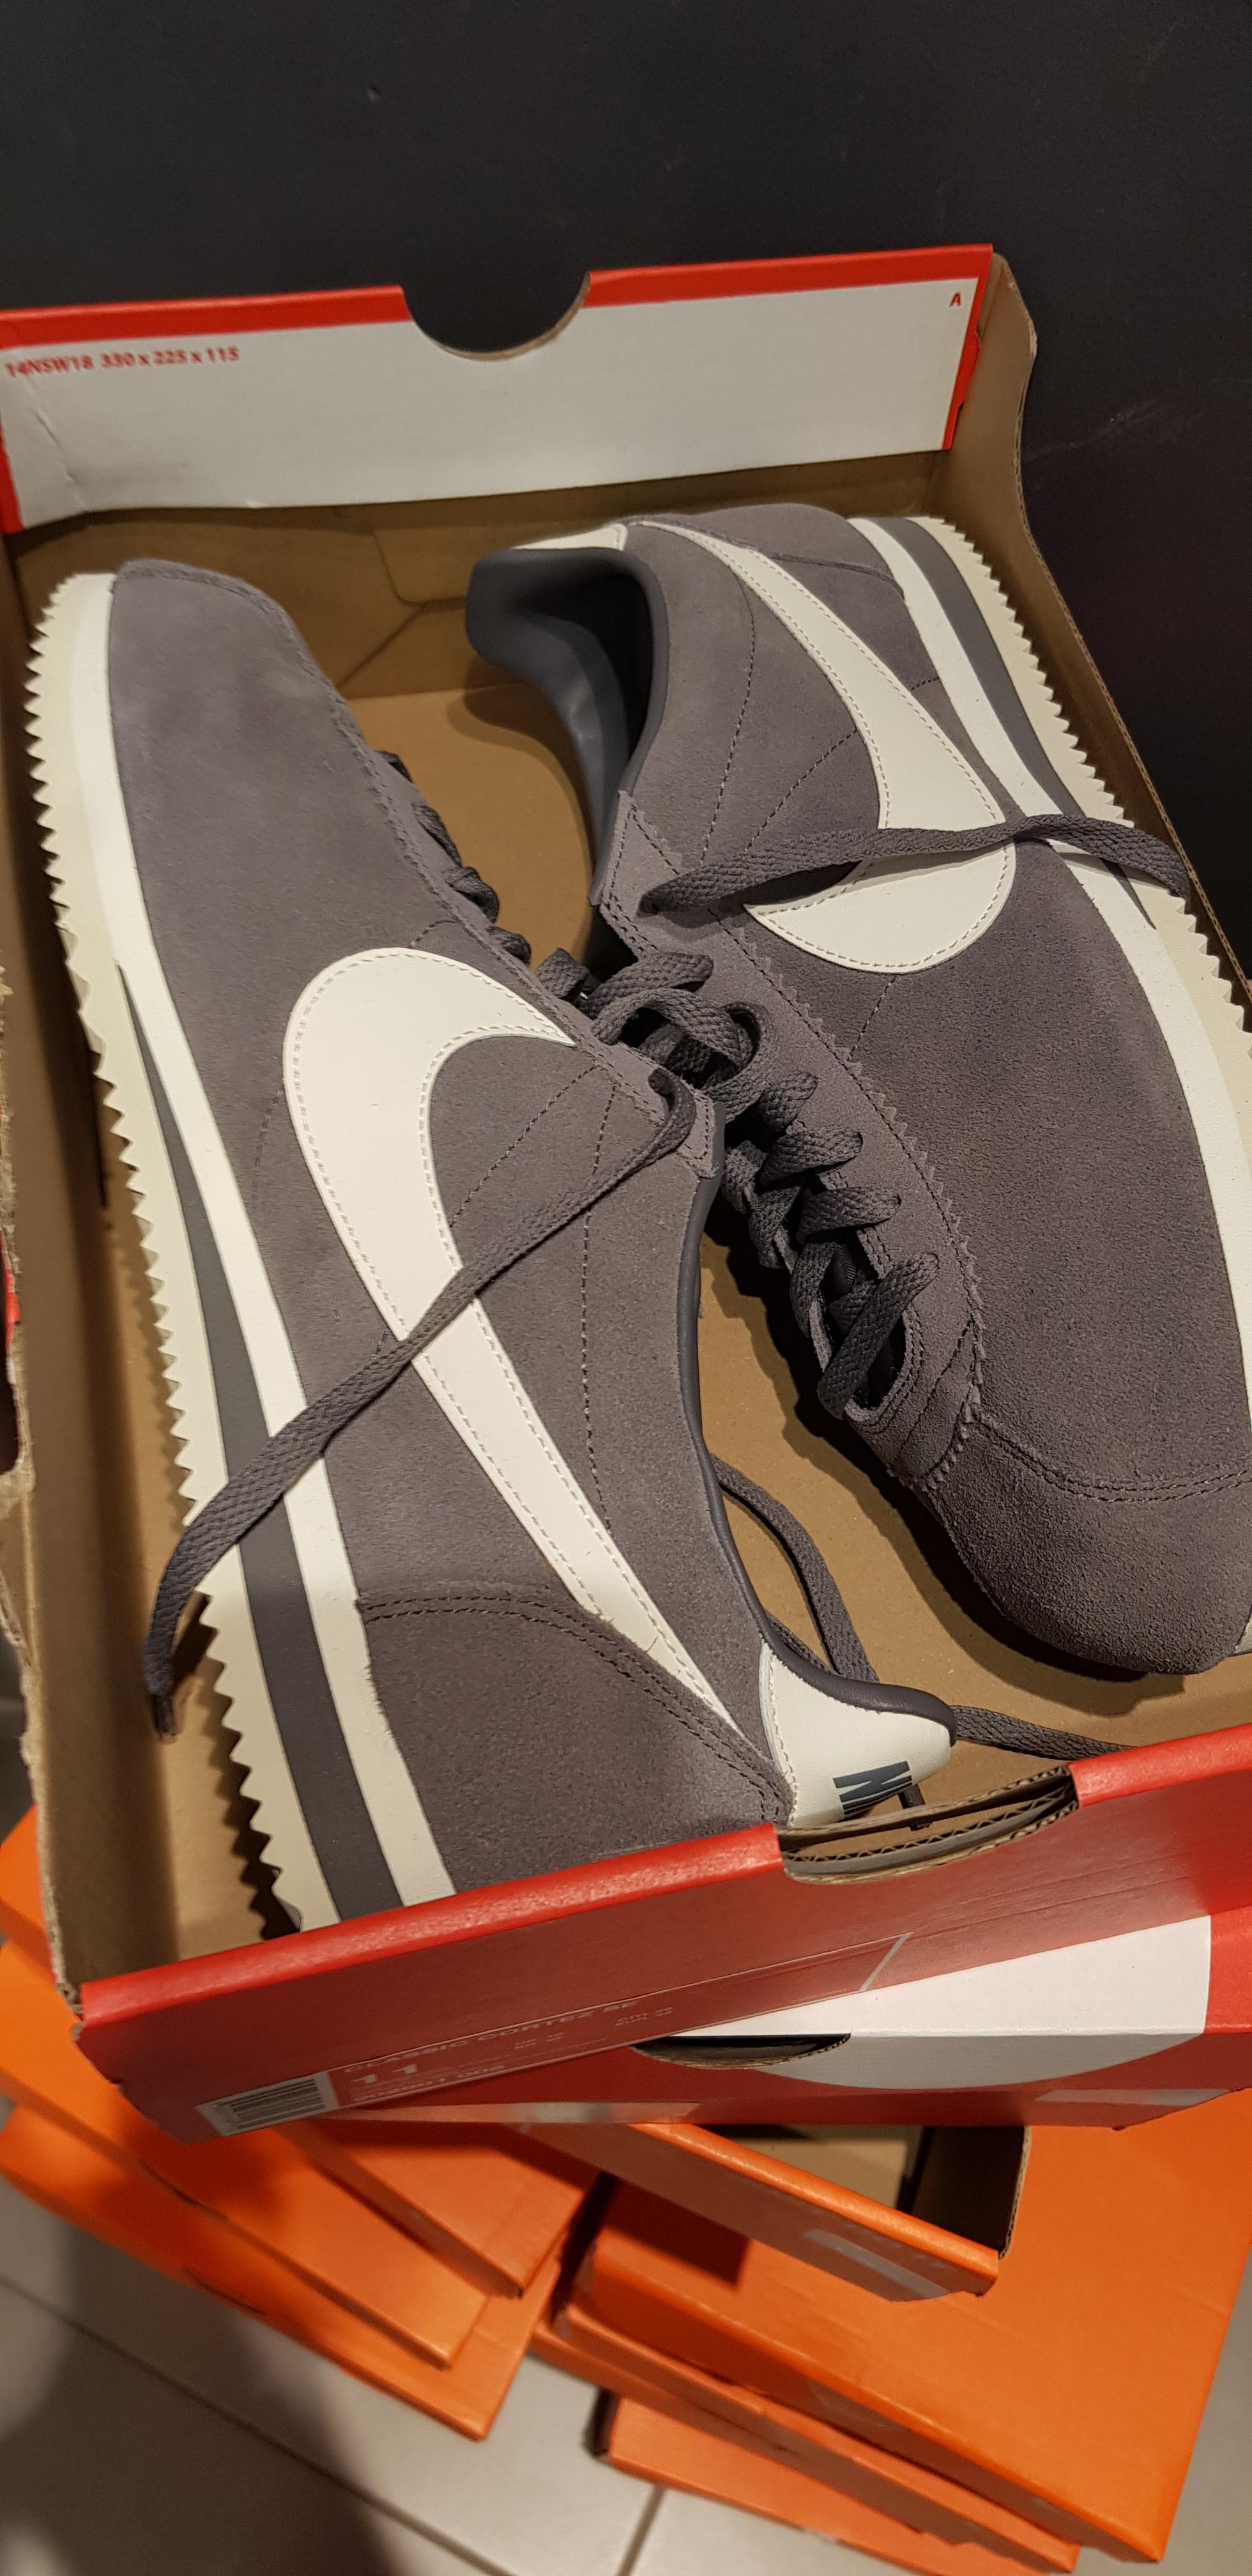 [Lokal] Nike Classic Cortez SE grau für 34€ (Ochtrup)